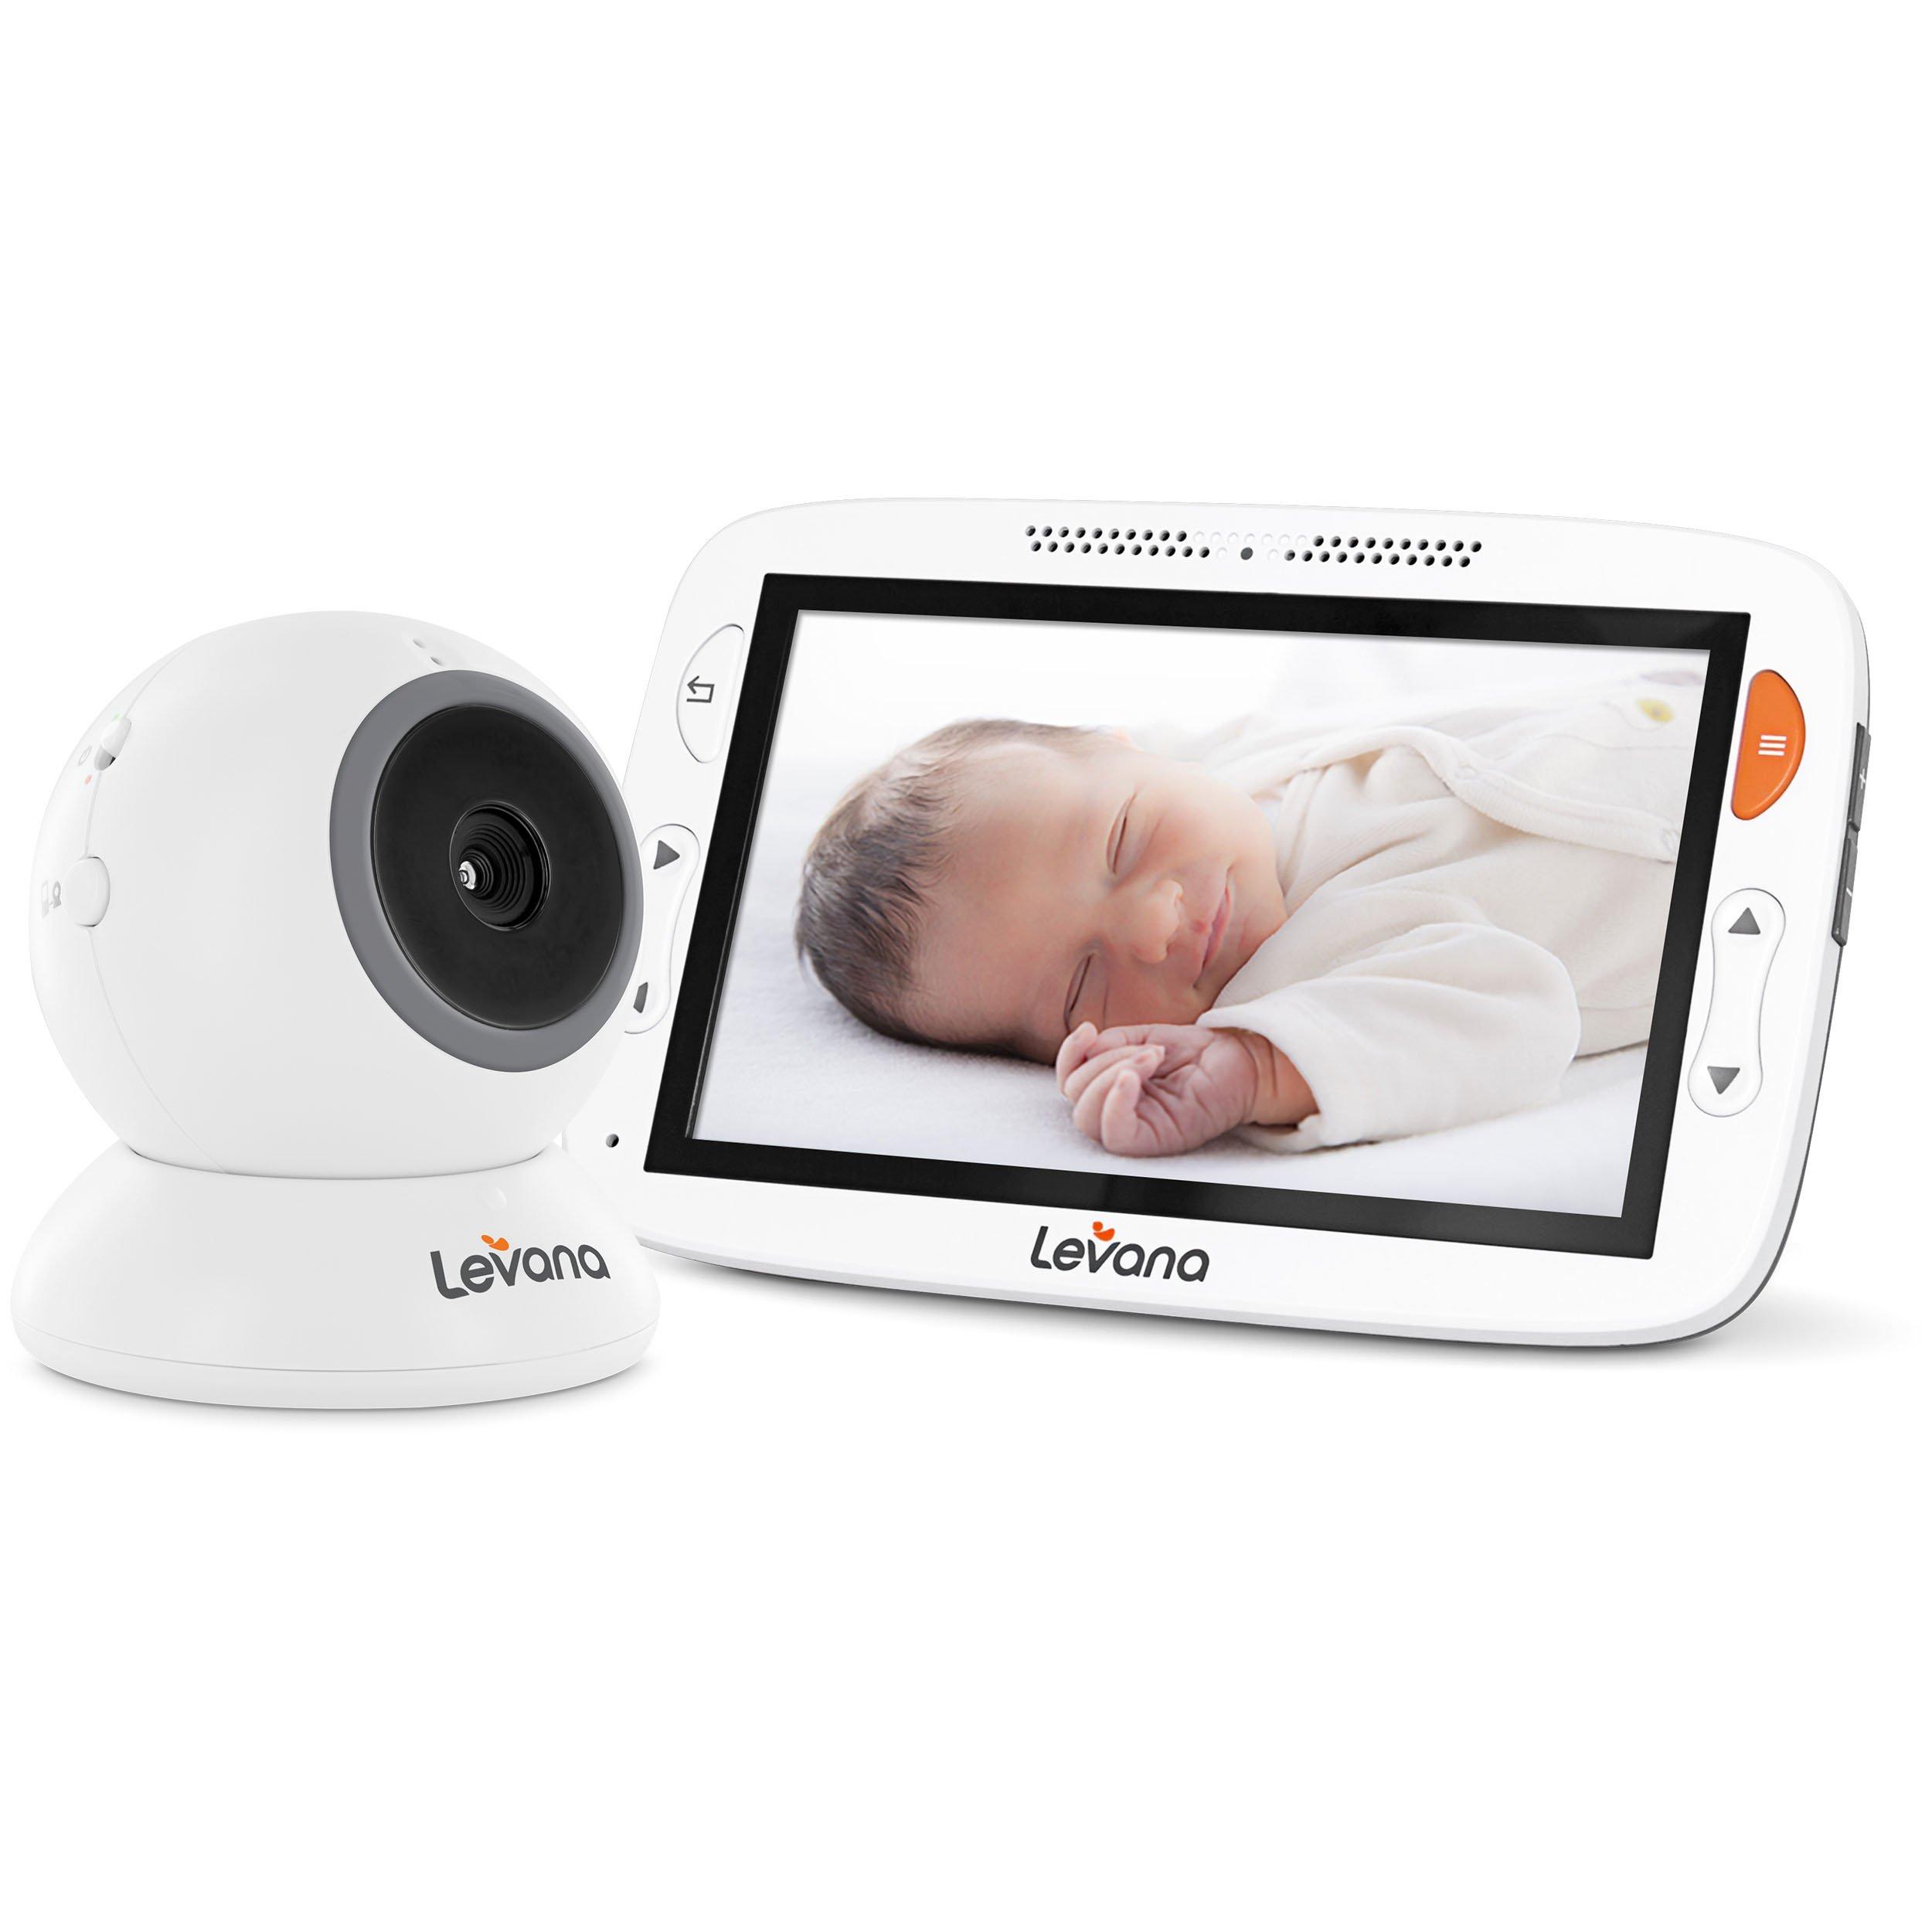 Levana Alexa 5'' LCD Video Baby Monitor